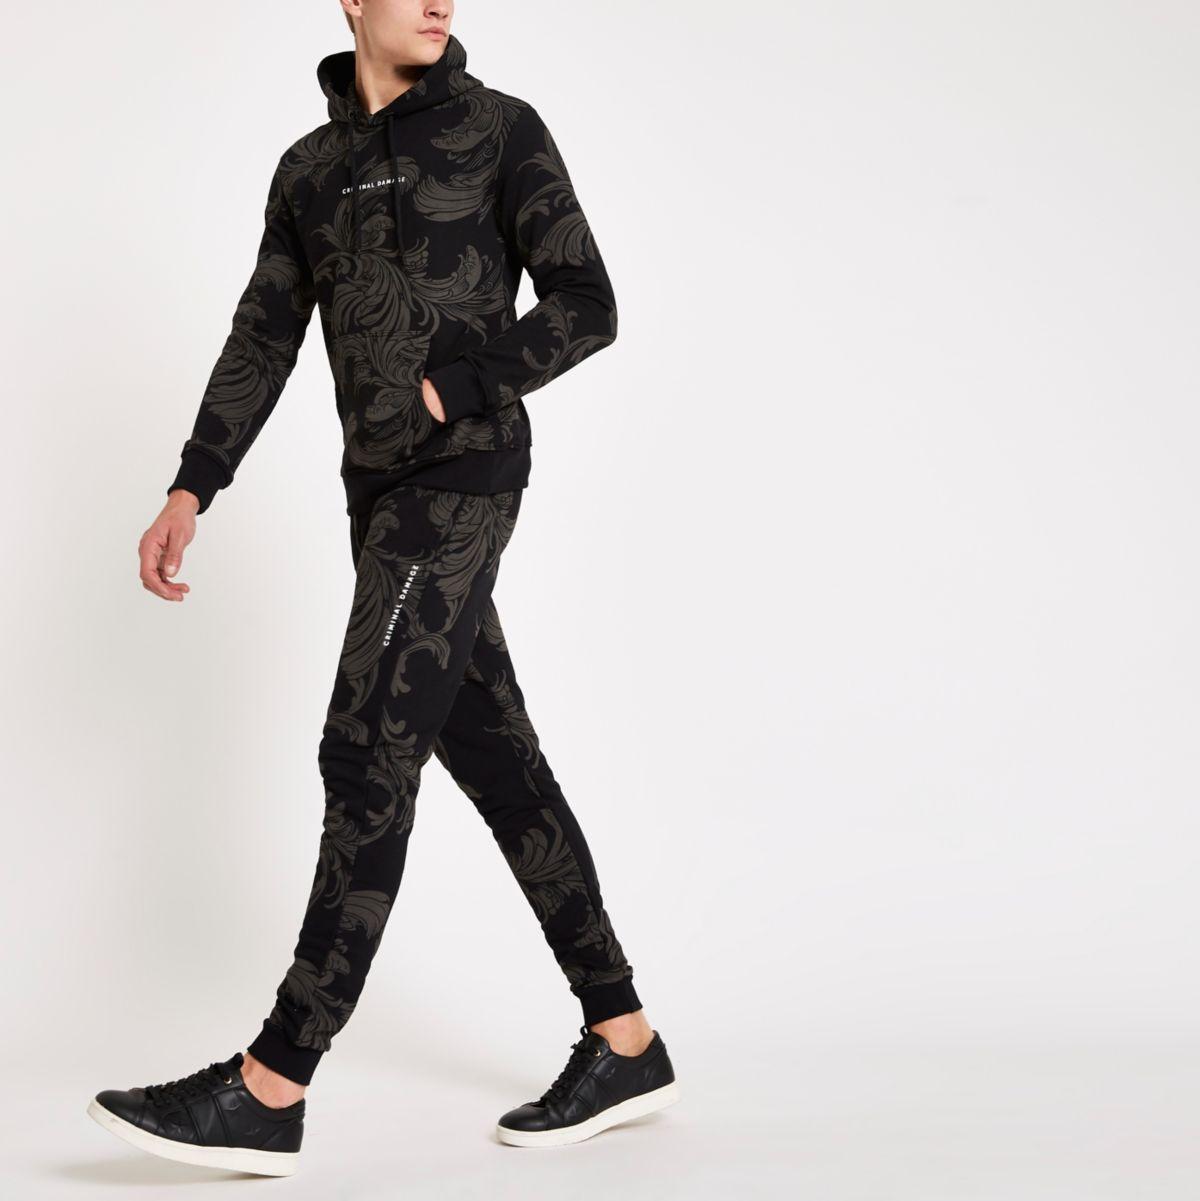 Criminal Damage black baroque print joggers